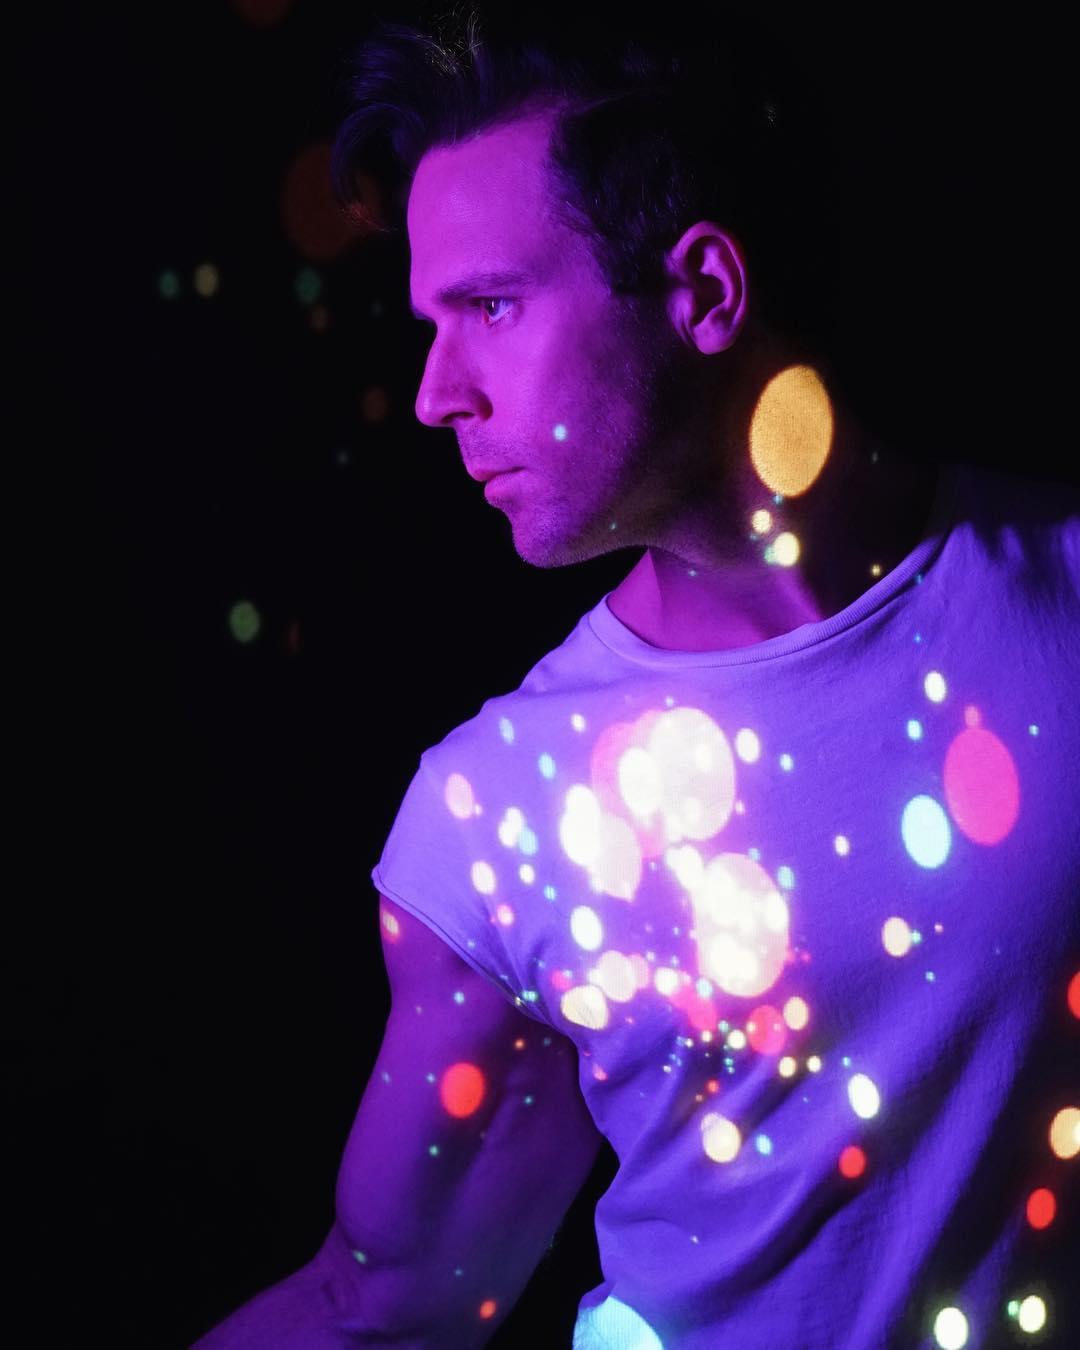 Creative City Project Cole NeSmith Interview | The Vinyl Warhol | Orlando music art blog